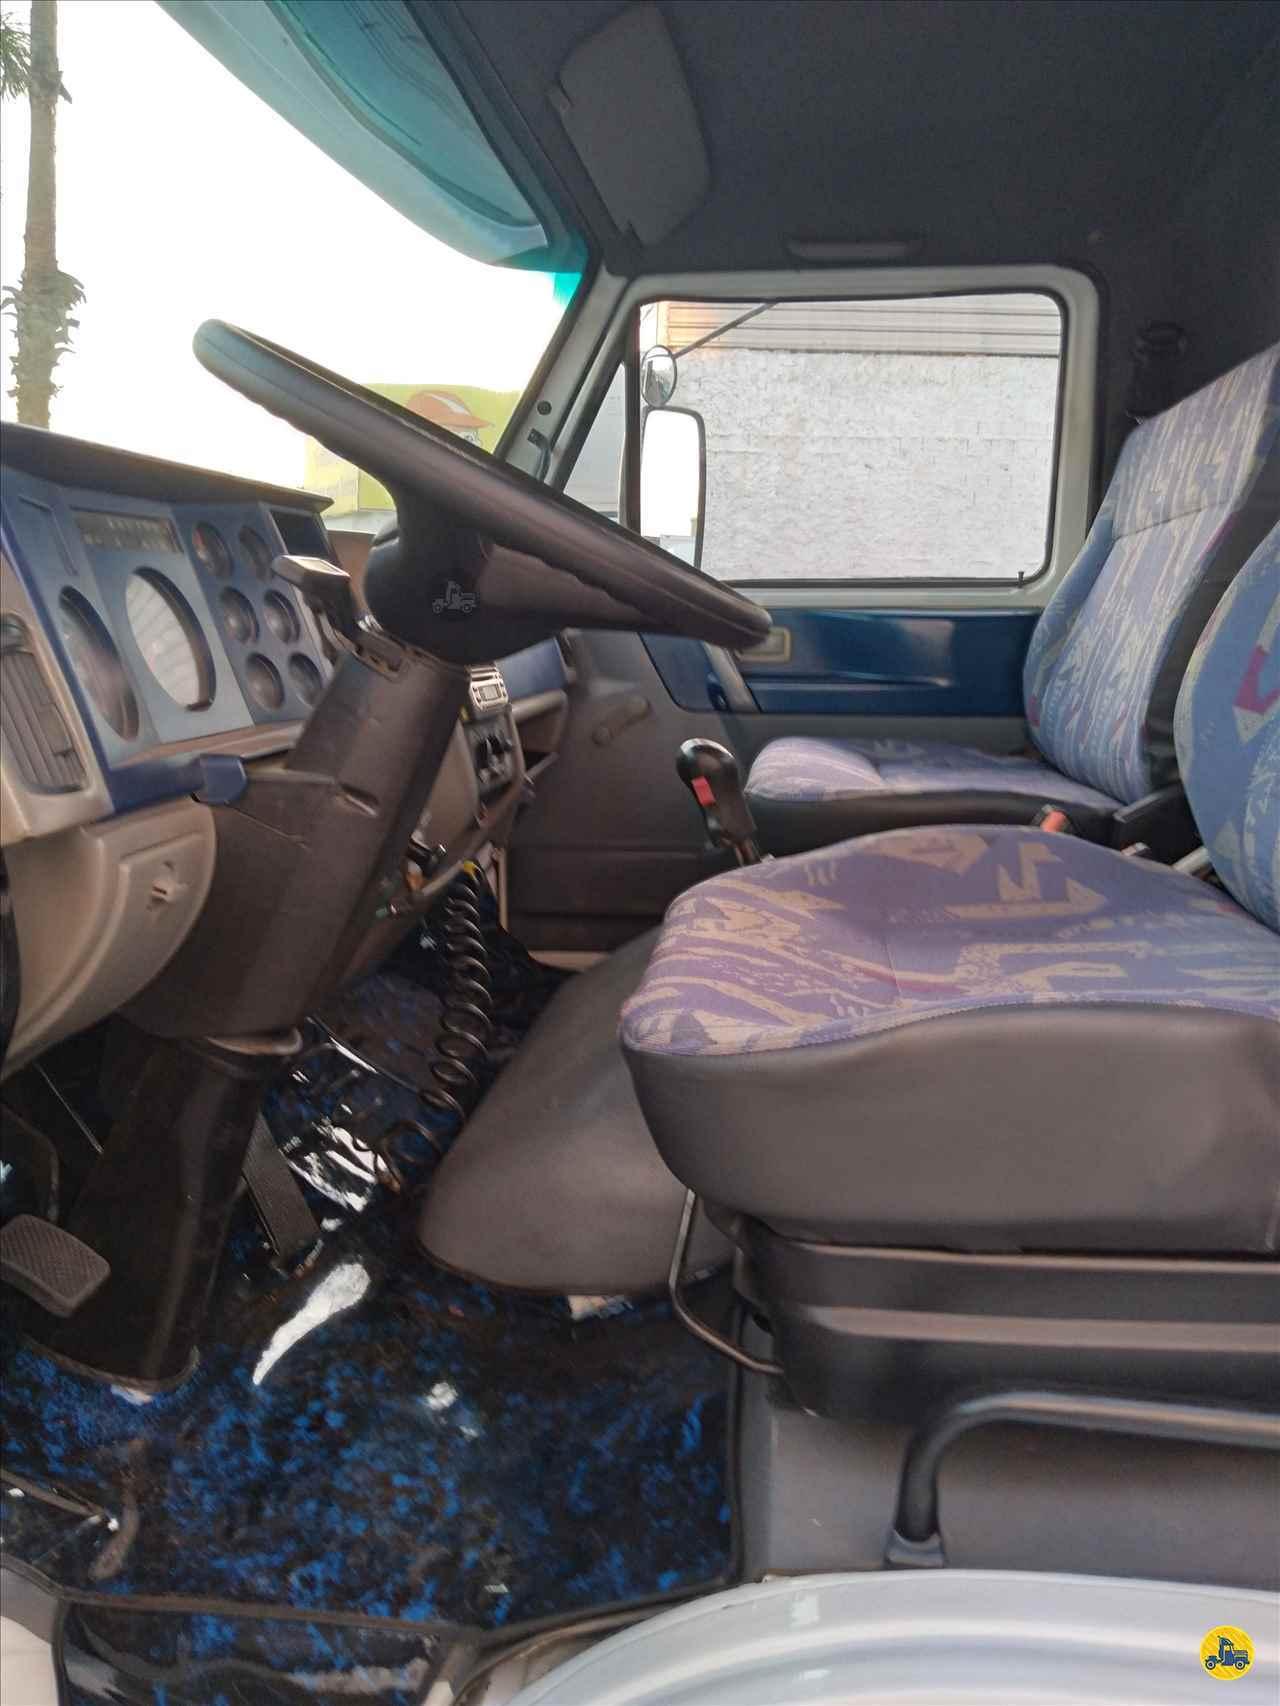 VOLKSWAGEN VW 13180  2008/2008 Adilson Caminhões